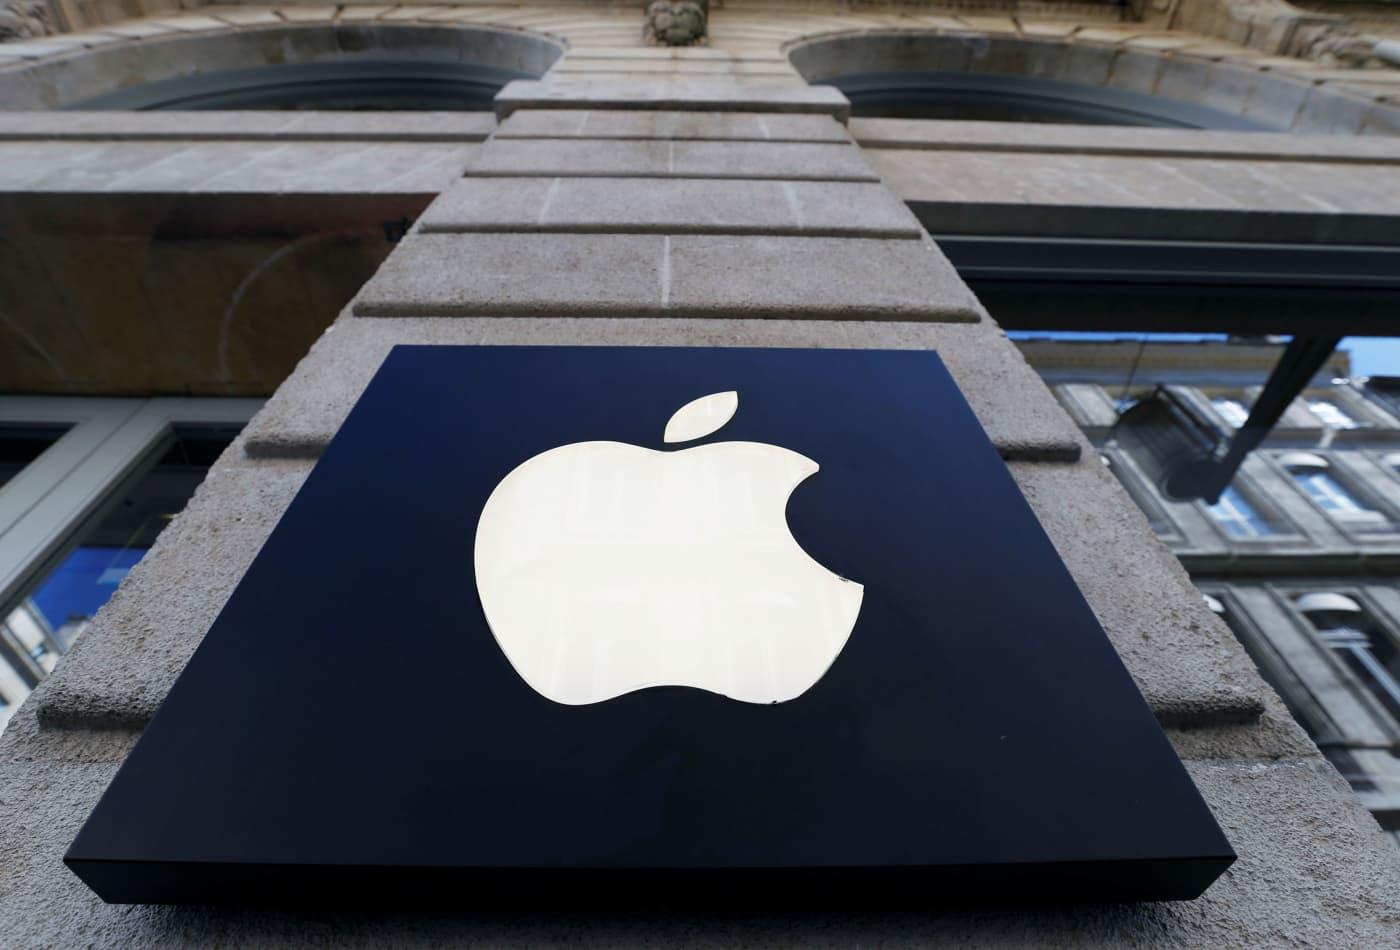 Here are Monday's biggest analyst calls of the day: Apple, Palantir, Winnebago, Lululemon & more